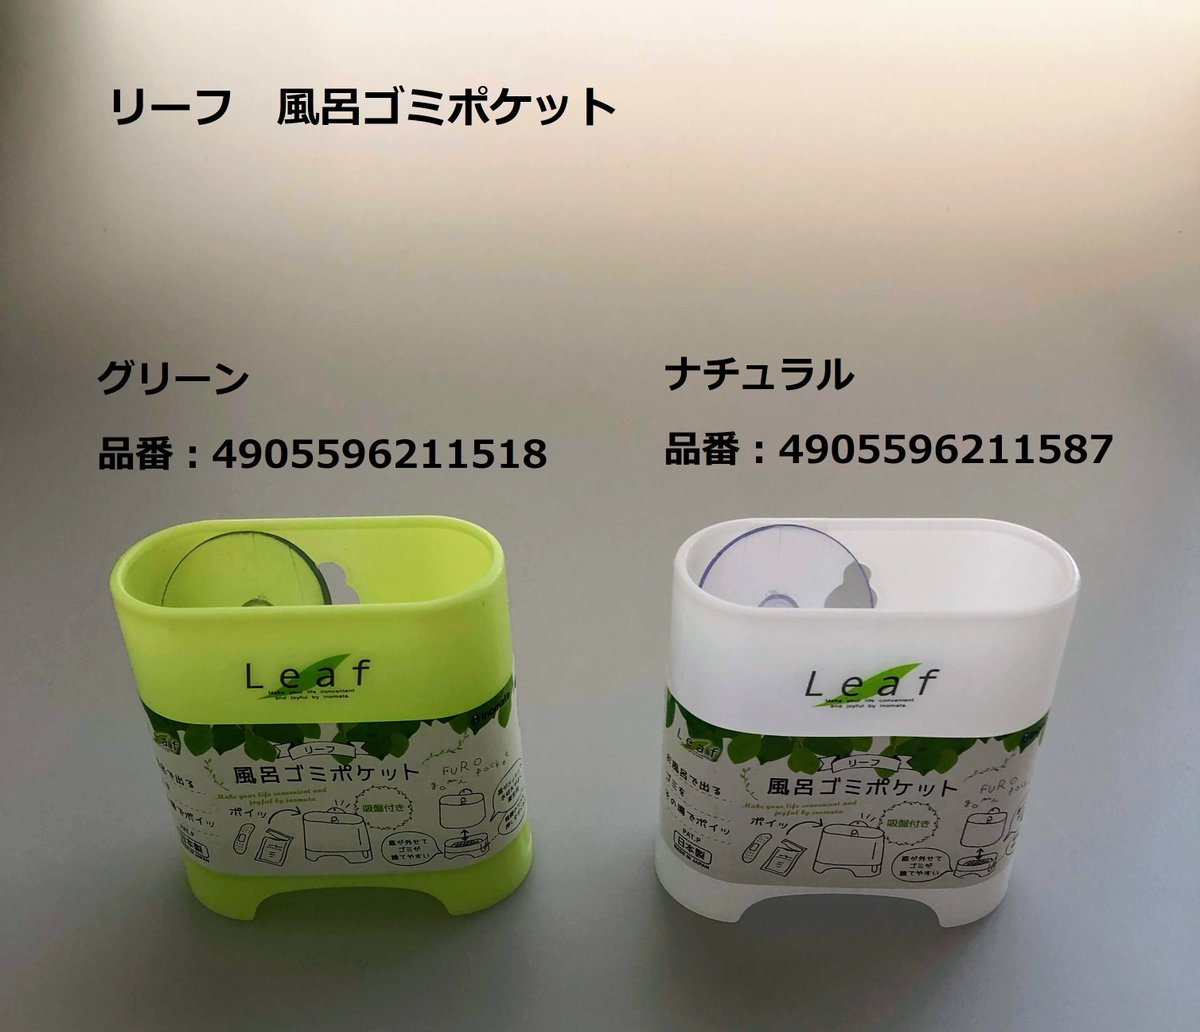 test ツイッターメディア - お風呂や洗面台のゴミをすっきり! 邪魔になりにくいデザインです。  #キャンドゥ #100均 #風呂 #ゴミ #ポケット #リーフ #バス #洗面所 #ゴミ箱 #ナチュラル #グリーン #吸盤付き #底が外せる #捨てやすい #水切れがよい #日本製 https://t.co/r4EjnfBlHU